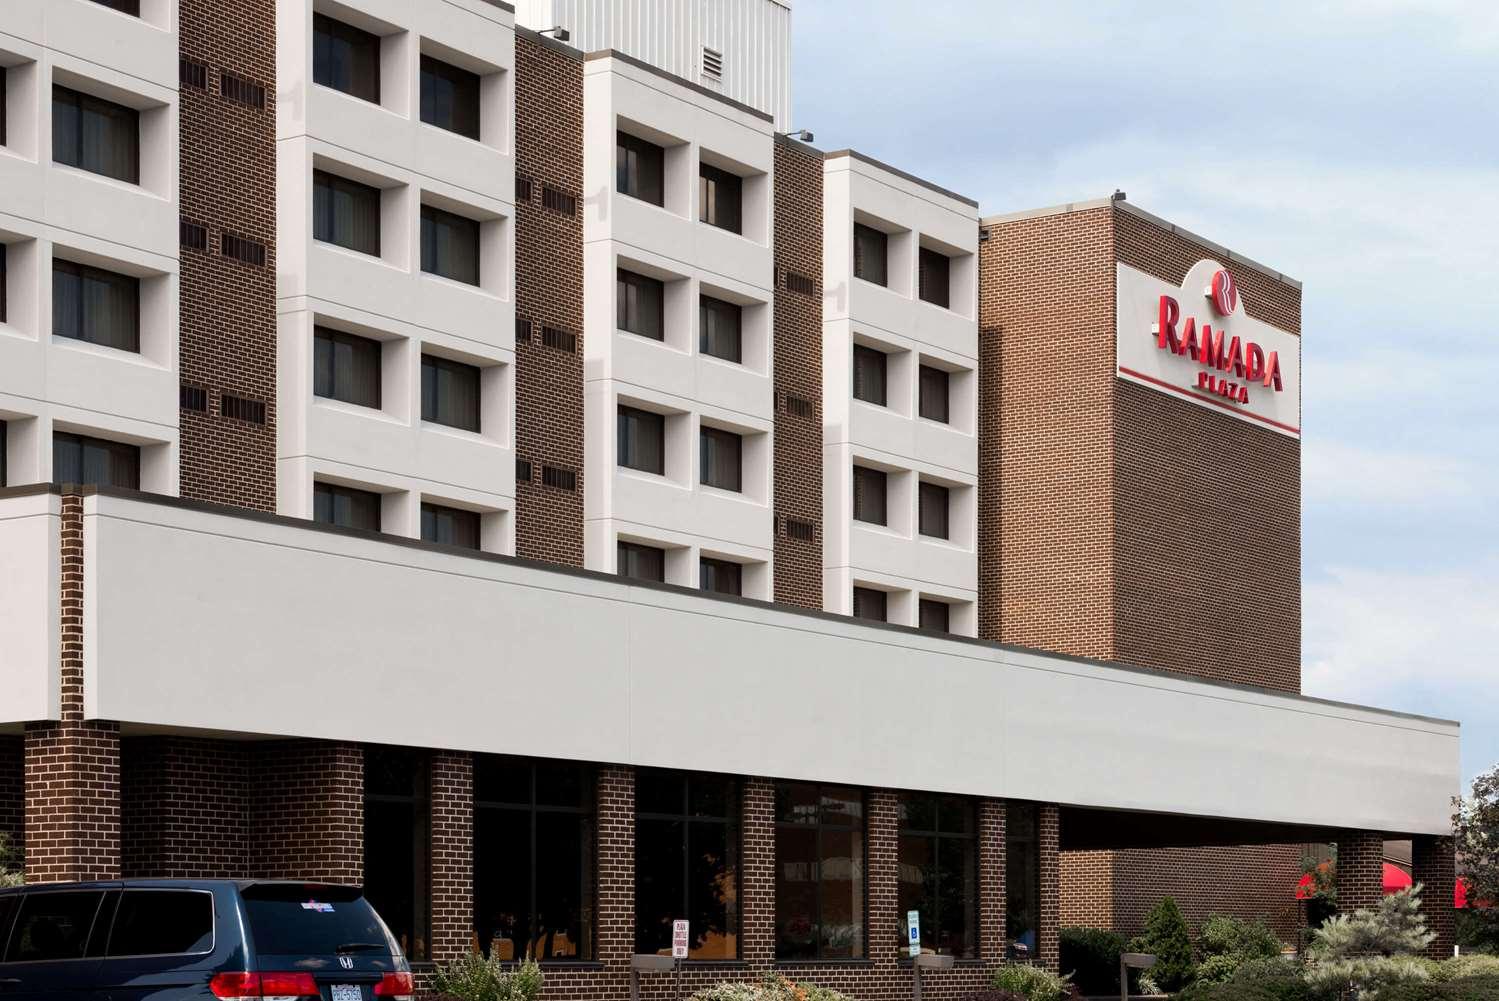 Exterior view - Ramada Plaza Hotel Hagerstown